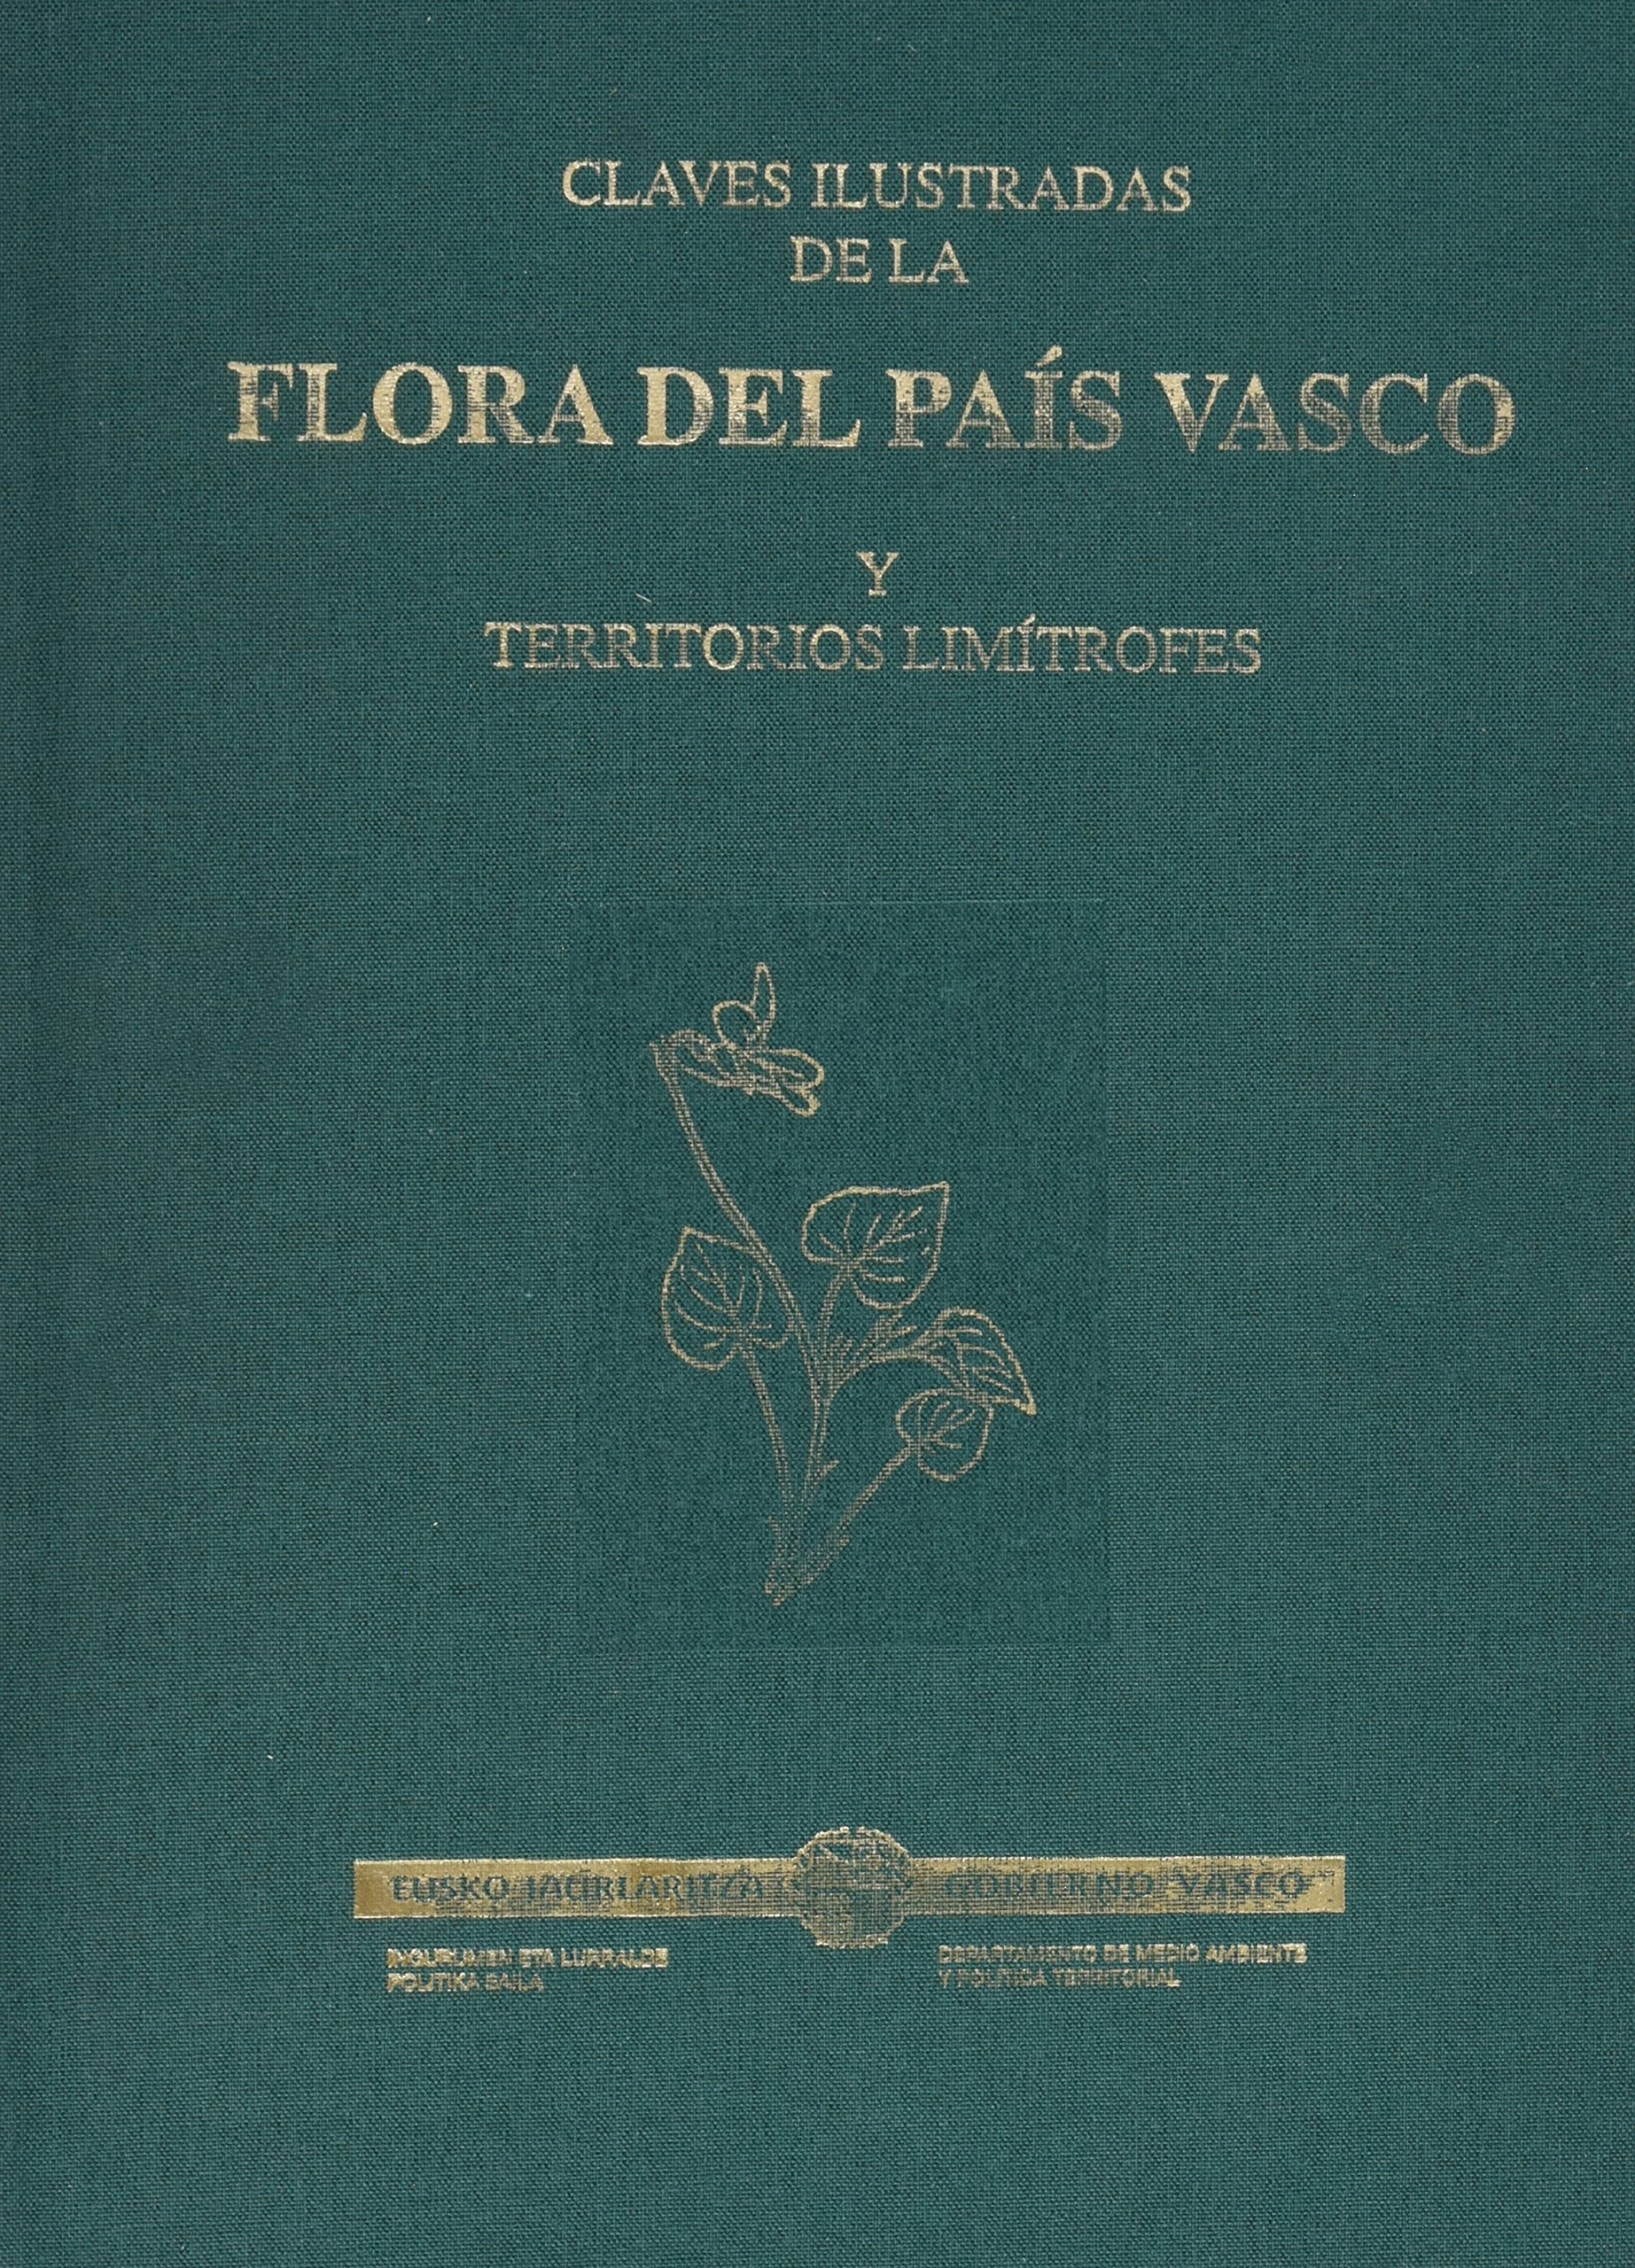 Claves Ilustradas De La Flora Del Pais Vasco Y Territ (Industri, Nekazaritza Eta Arra) (Euskera) Tapa blanda – 6 jul 1999 Aizpuru Eusko Jaurlaritza 2 8445713965 Botany & plant sciences